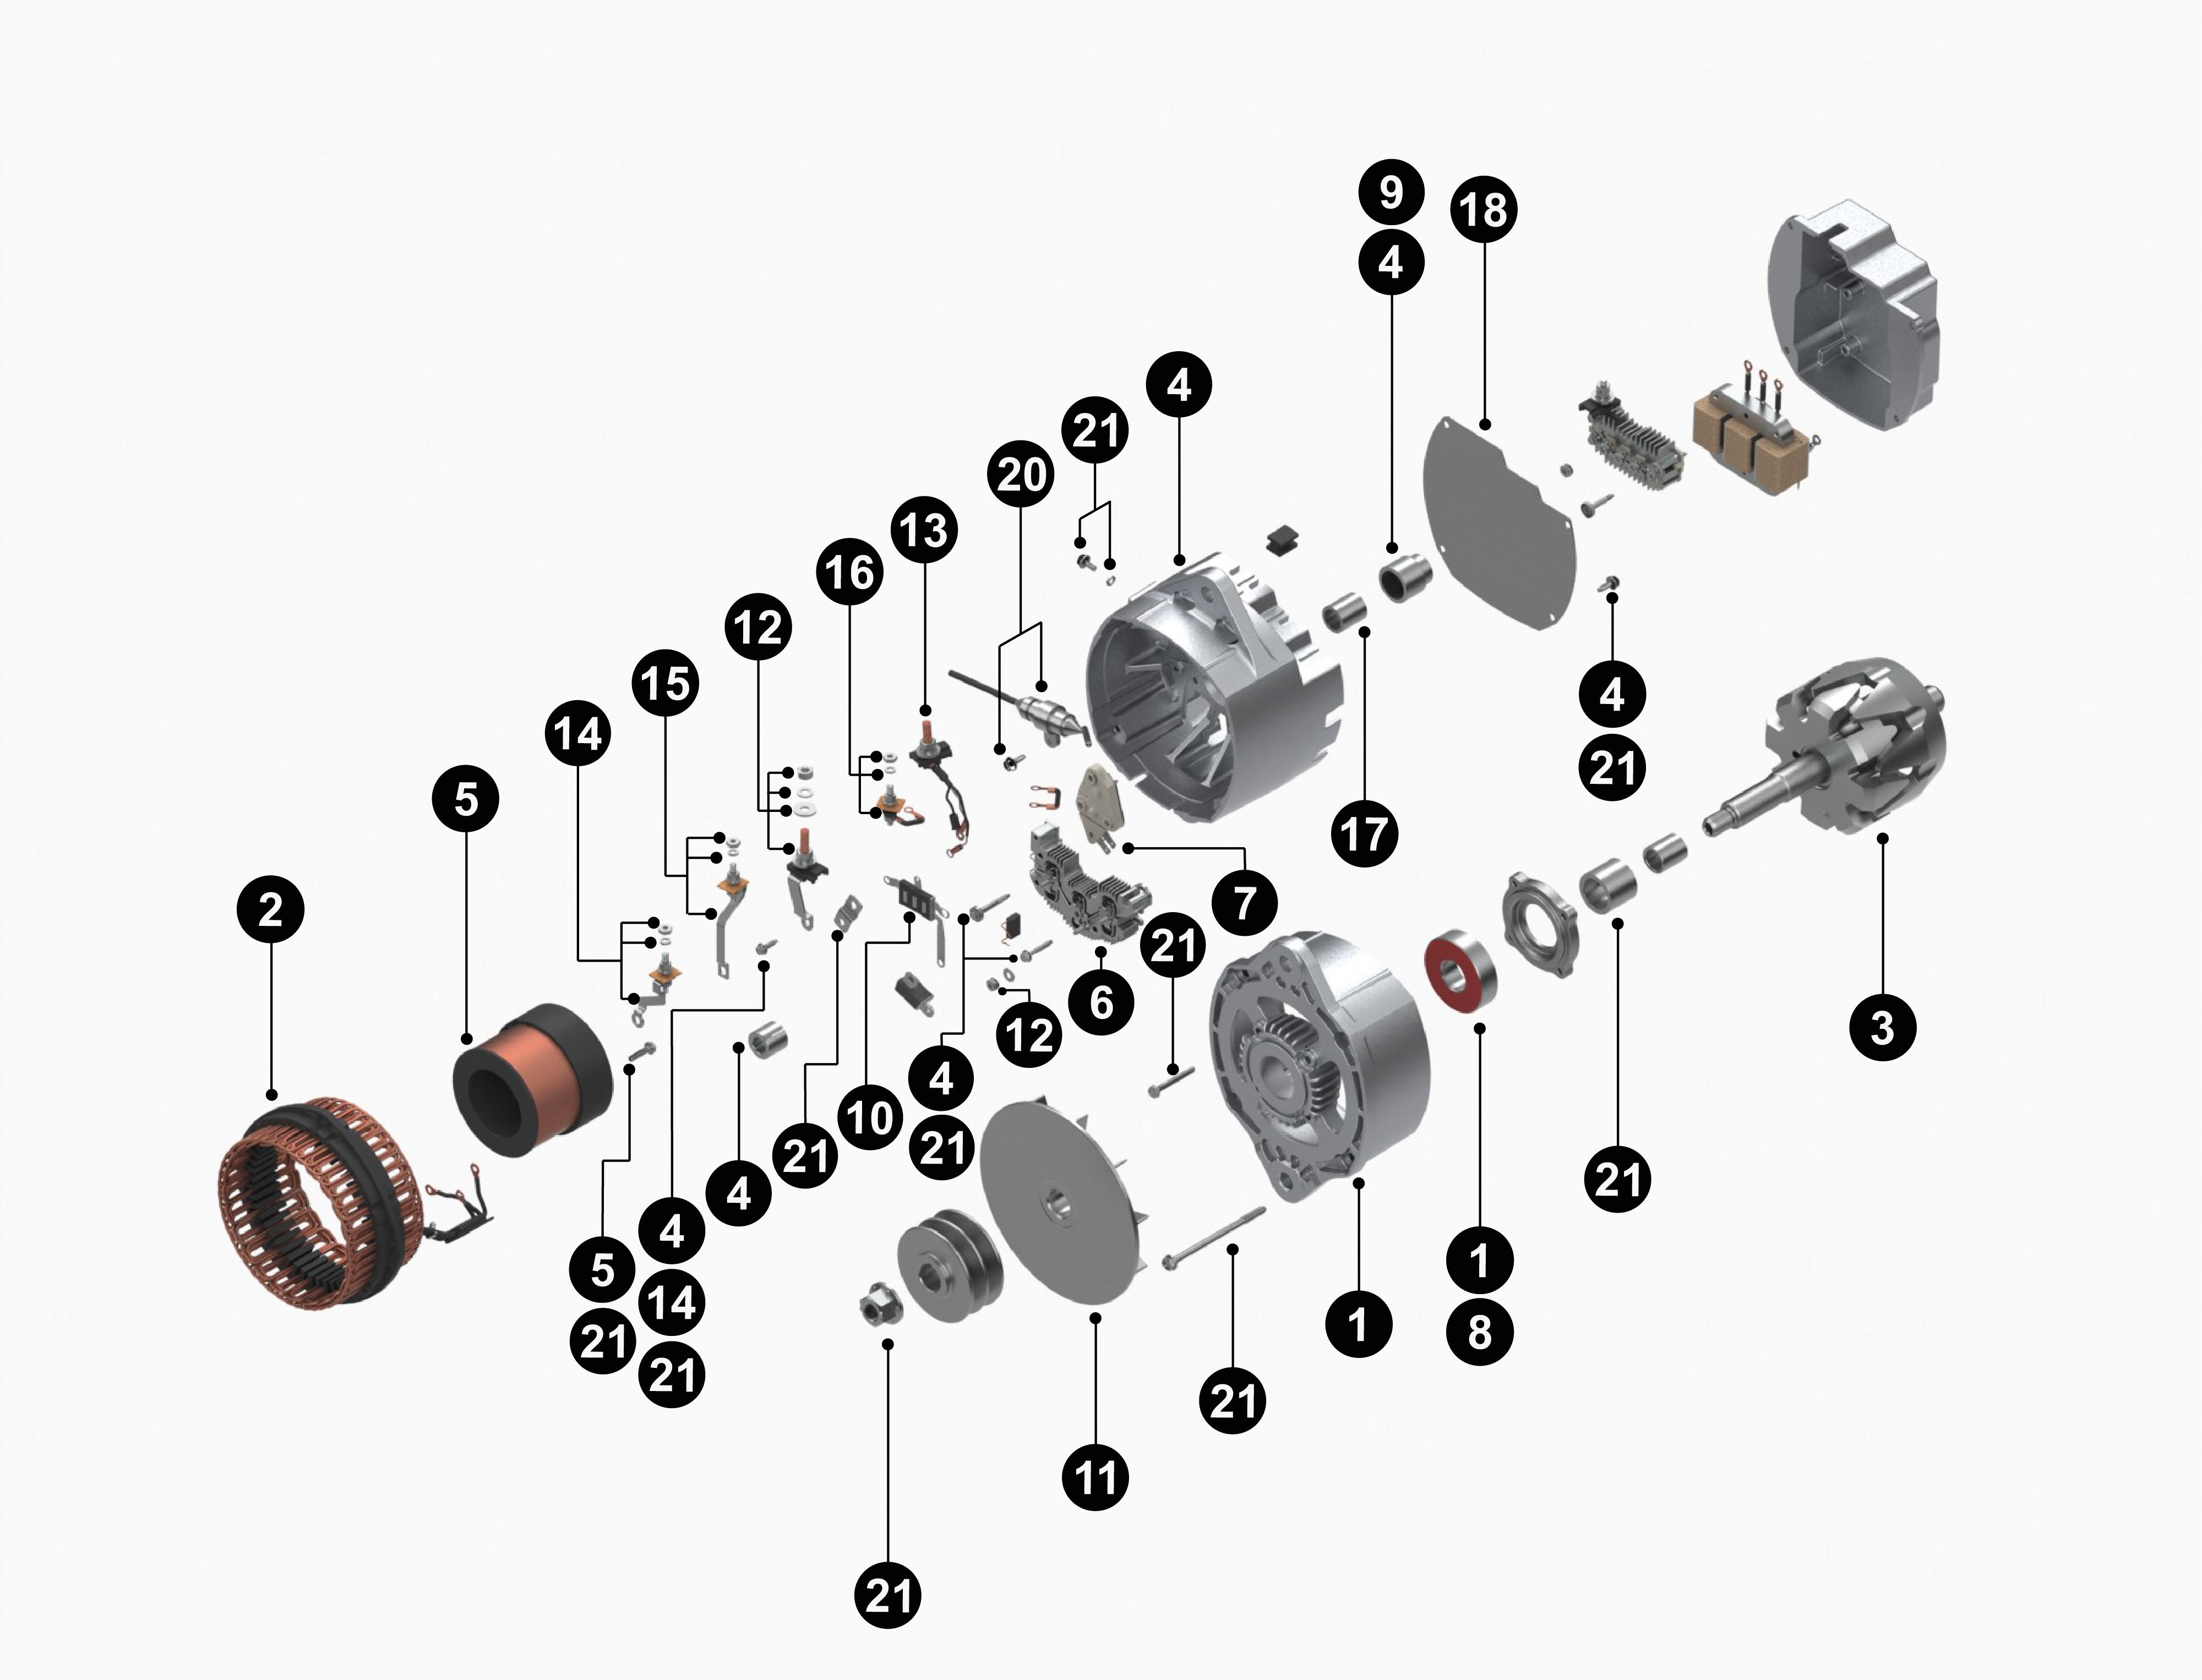 delco remy alternator diagram danfoss fridge thermostat wiring 55si repair scheme